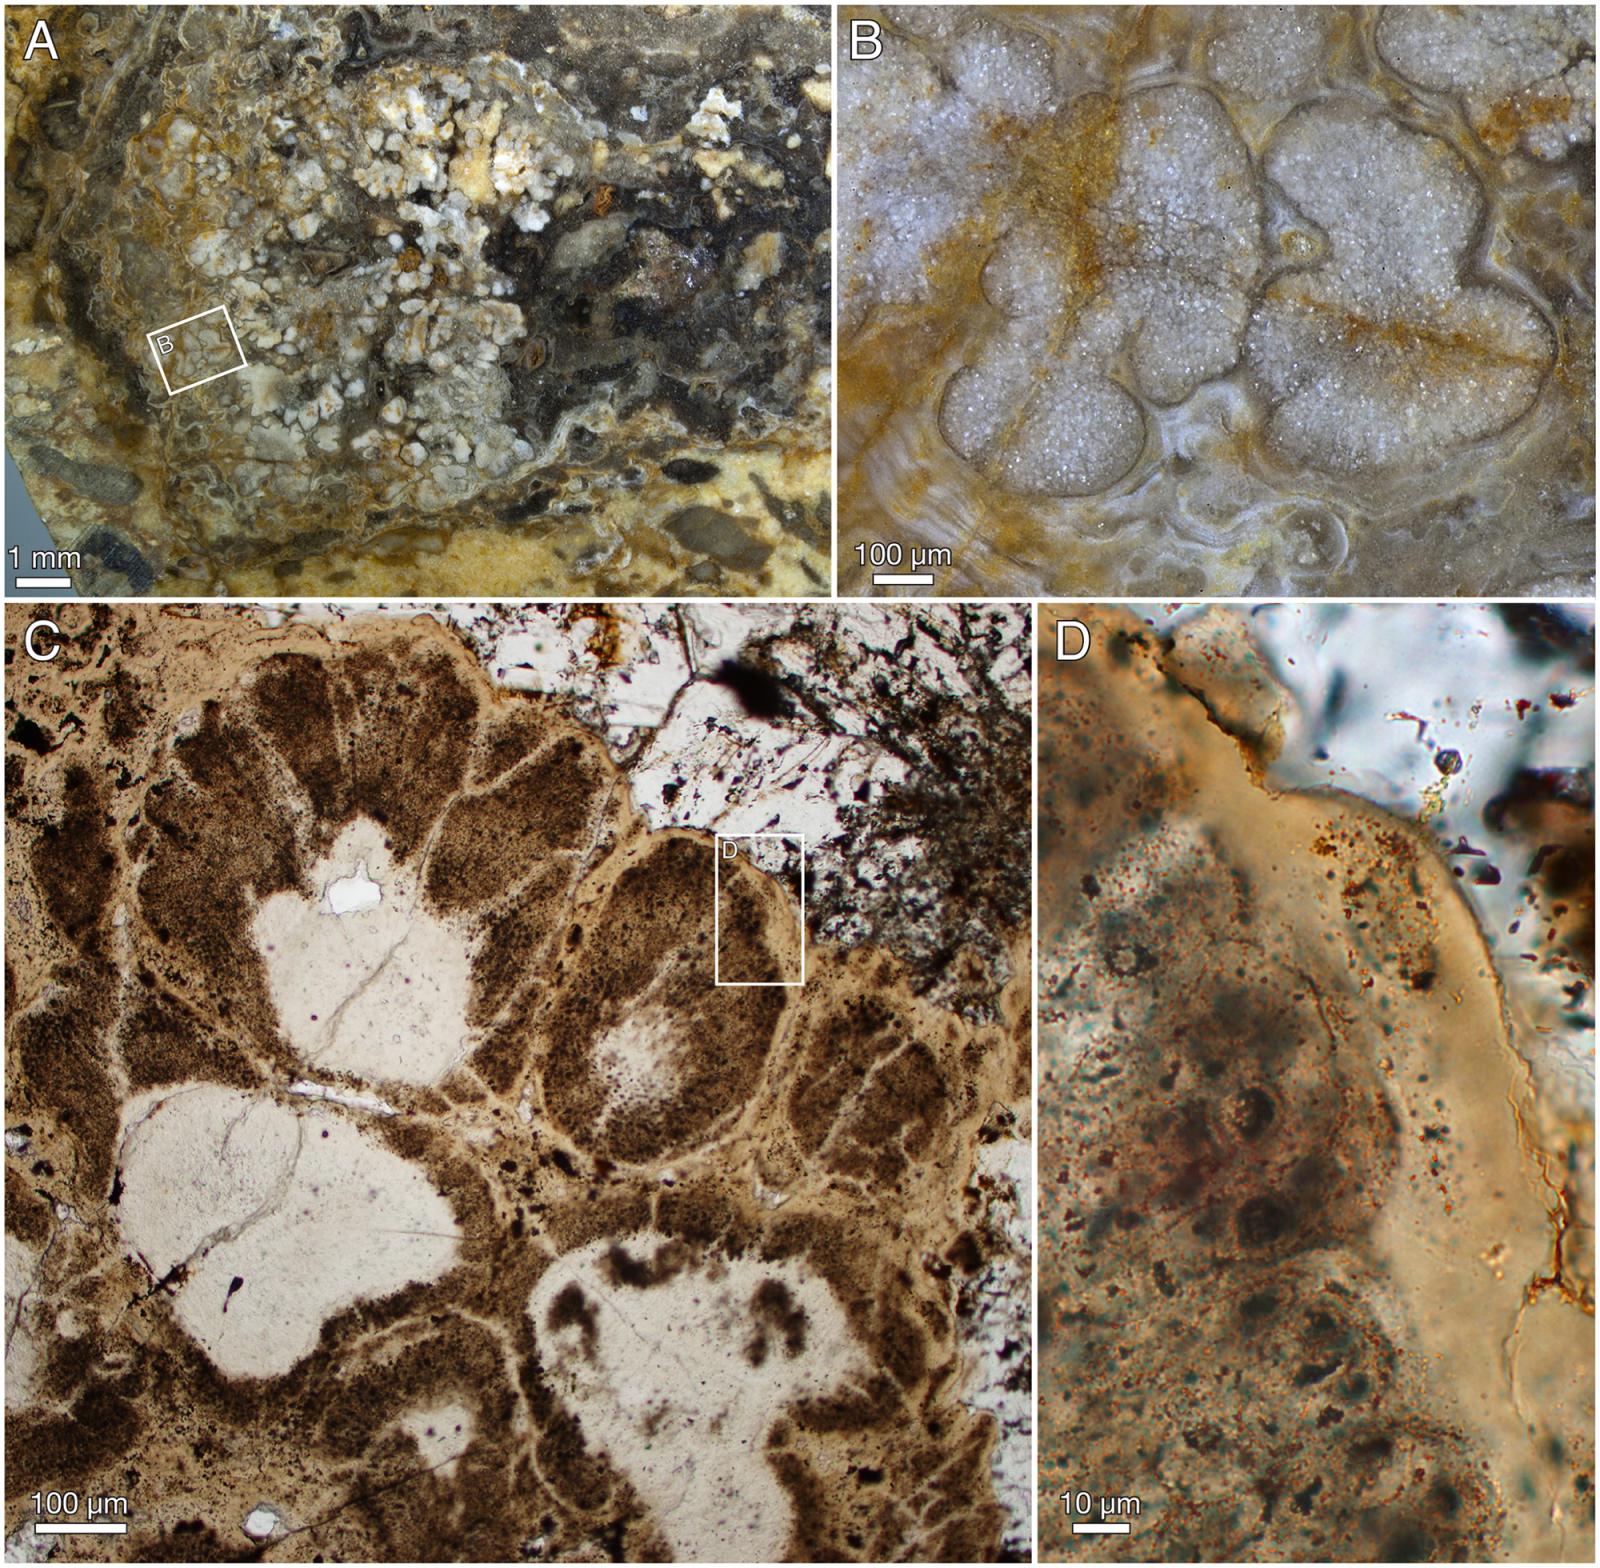 Red algae fossils